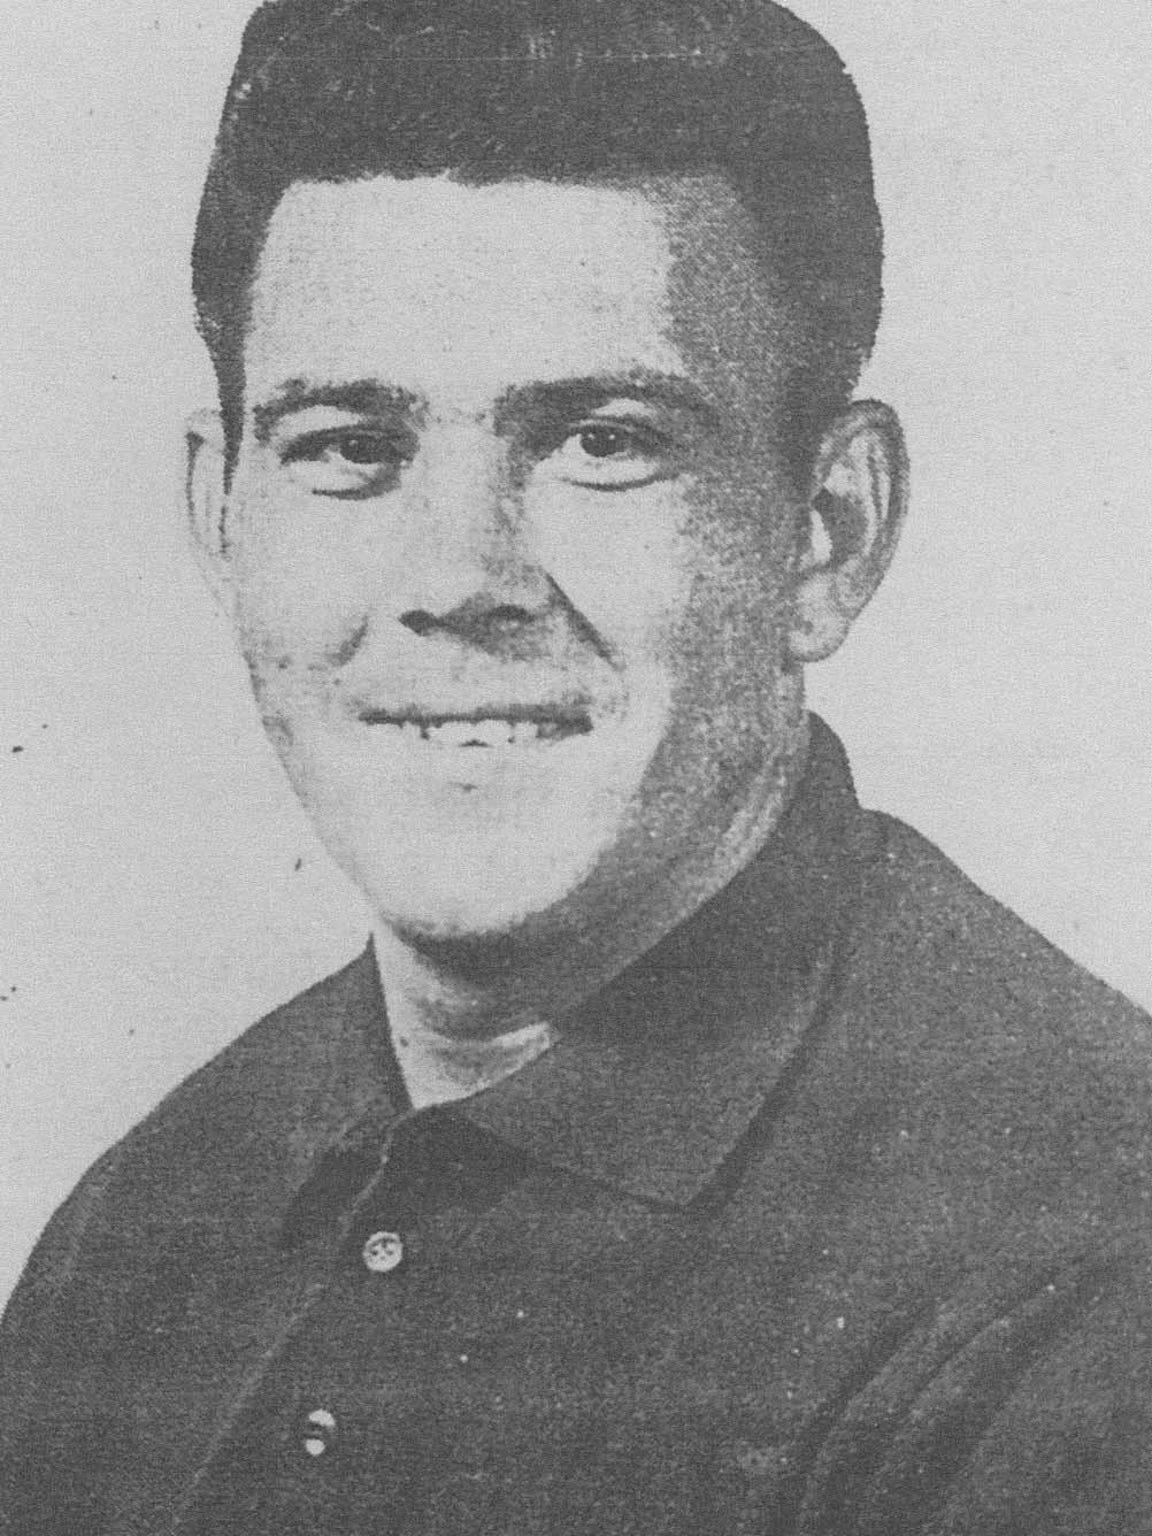 James Edward Hayton was convicted of the January 1967